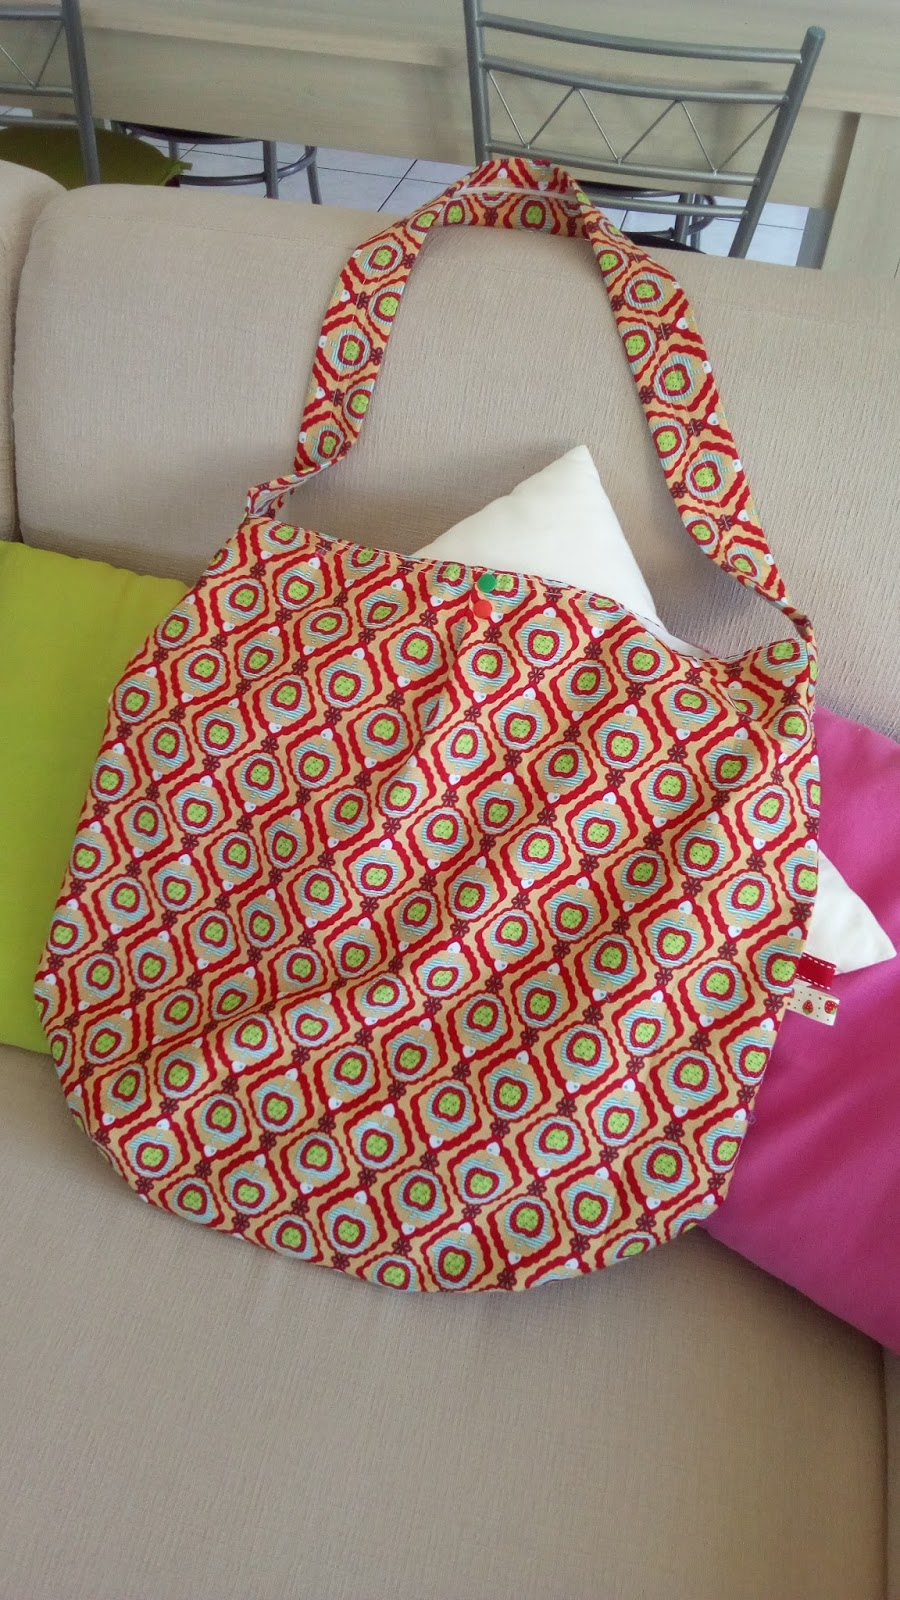 couture loisir sac de plage dames. Black Bedroom Furniture Sets. Home Design Ideas